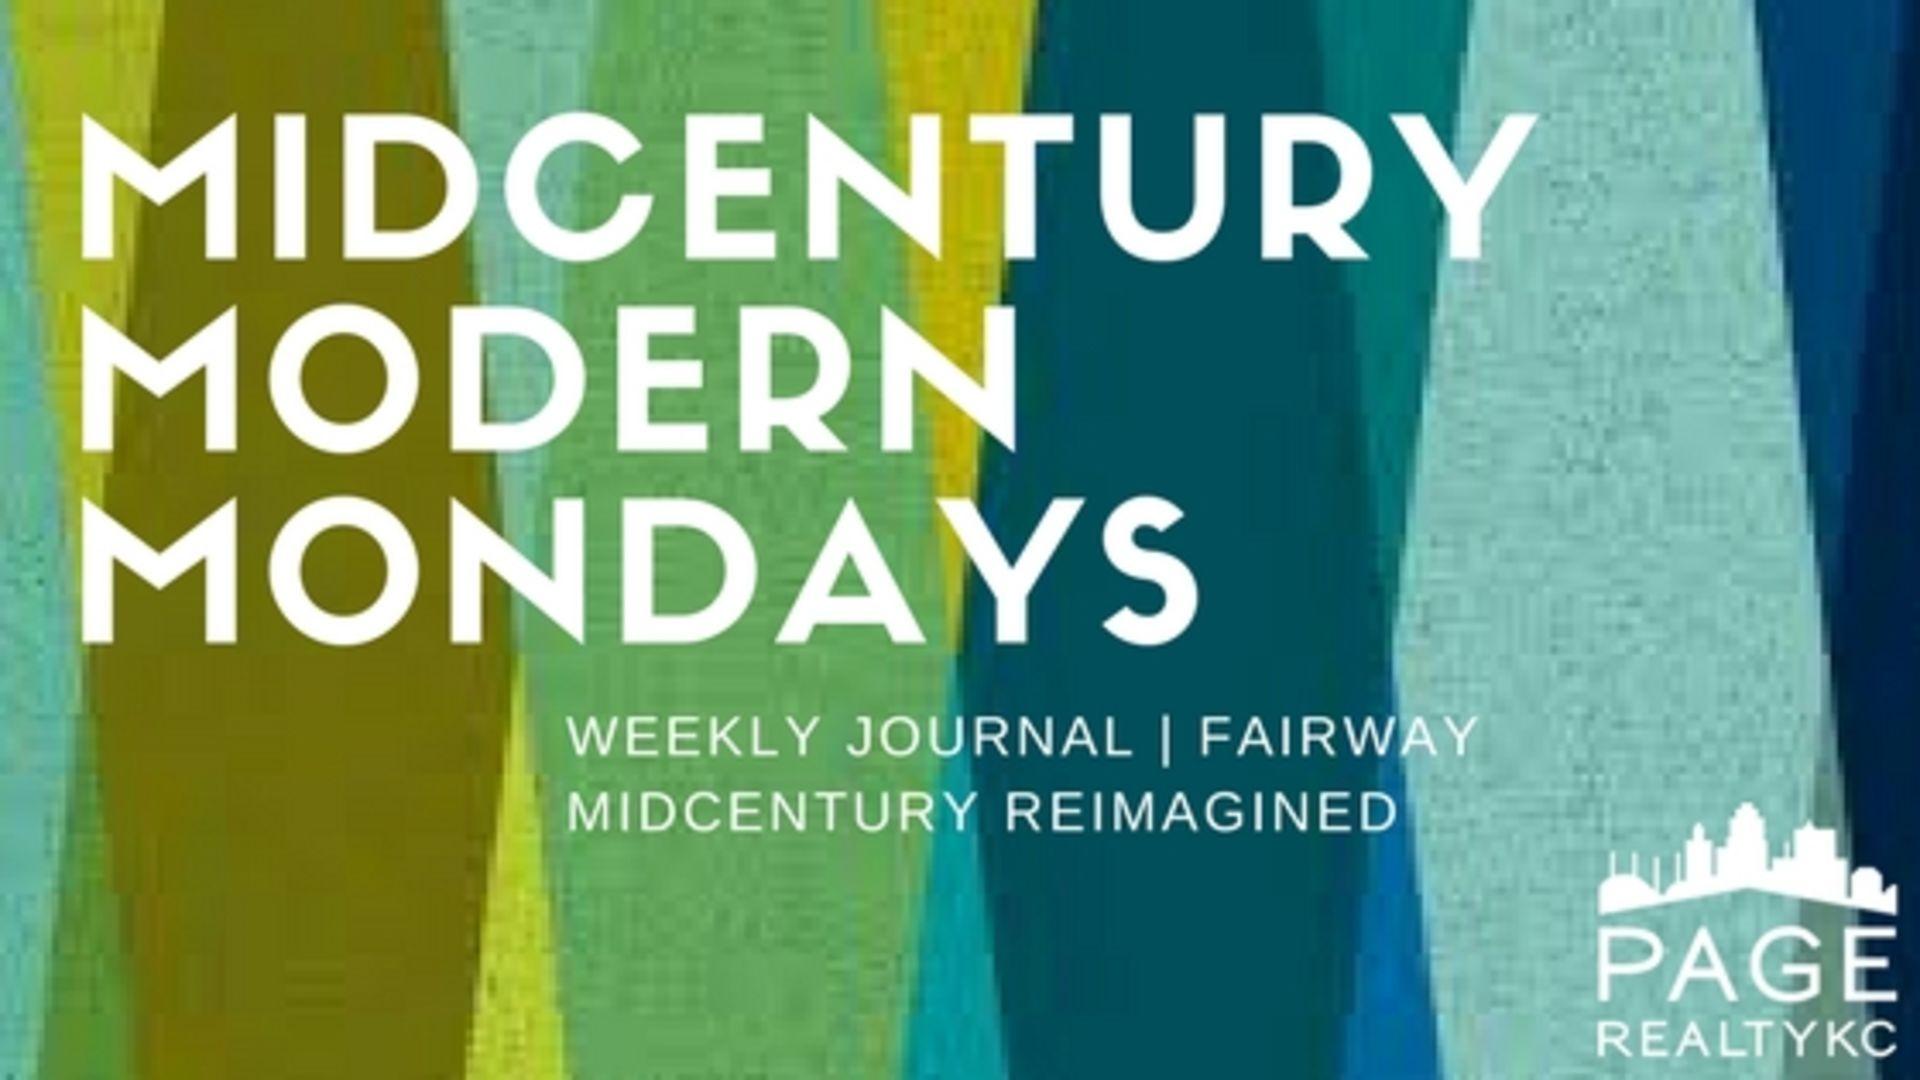 Midcentury Modern Monday August 14th – Exterior Landscape